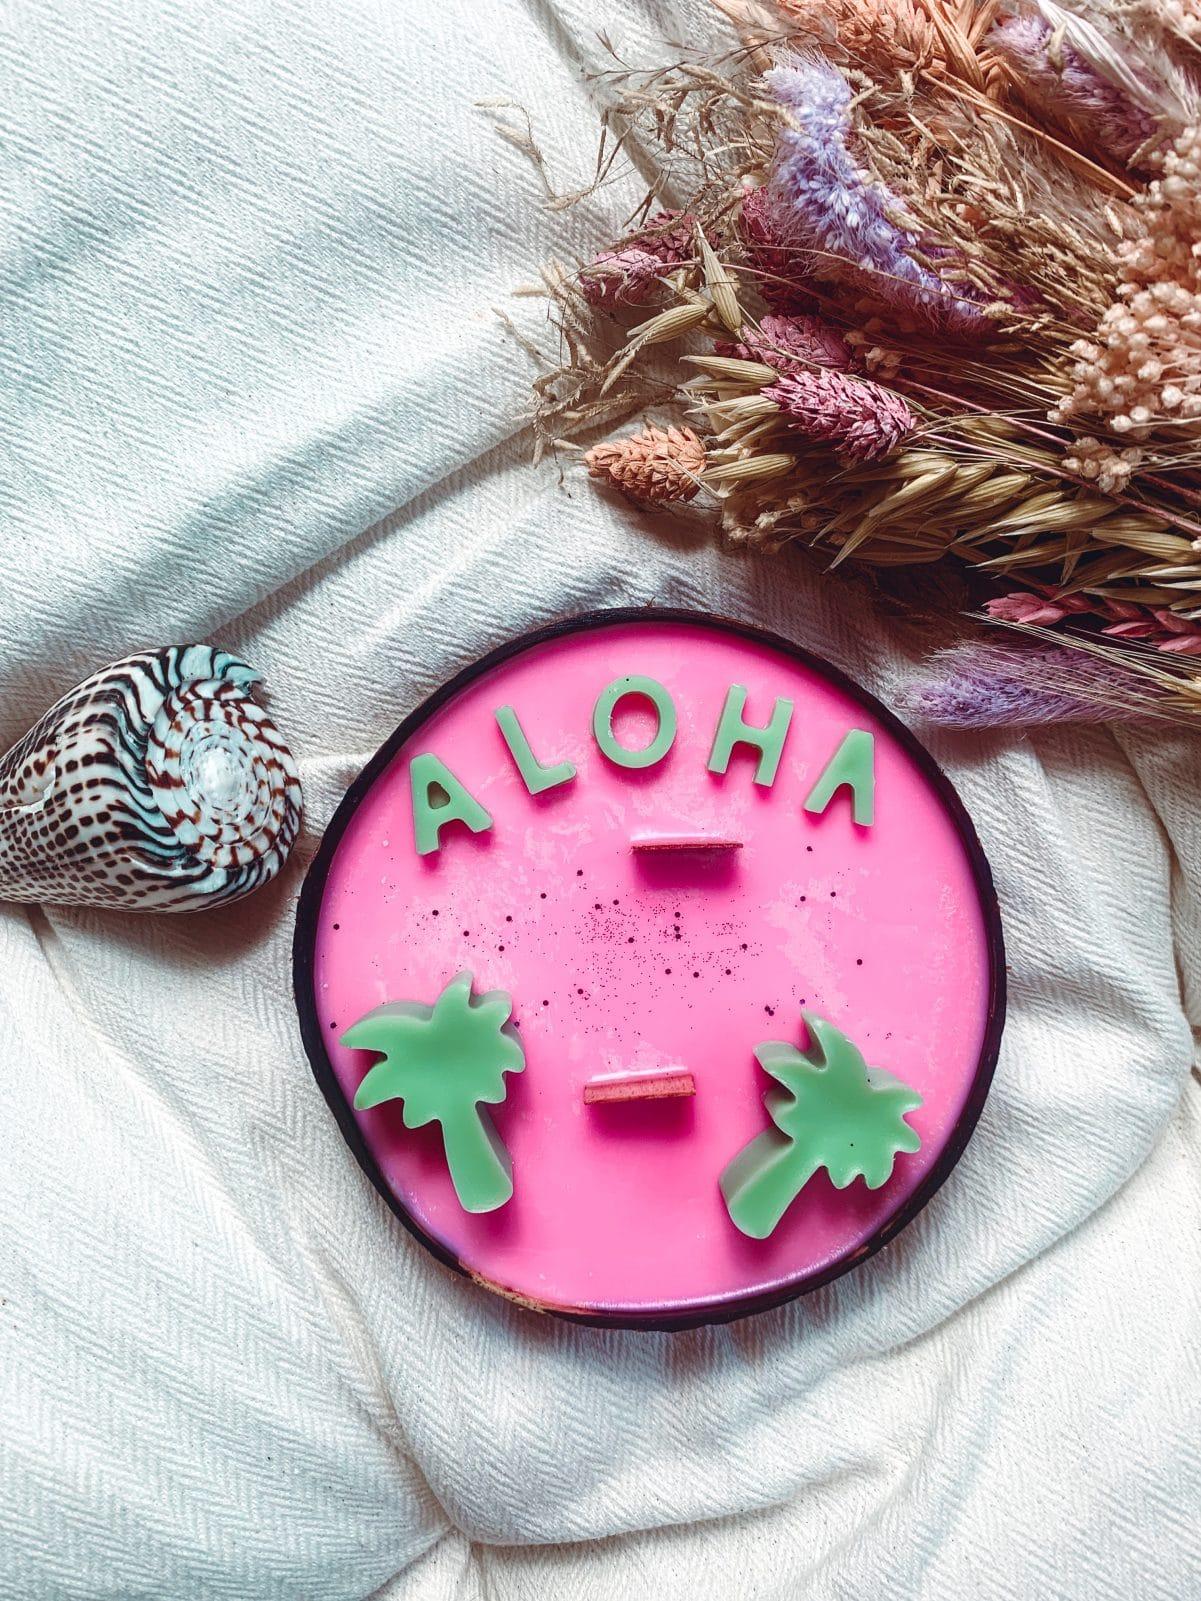 bougie aloha vegetale